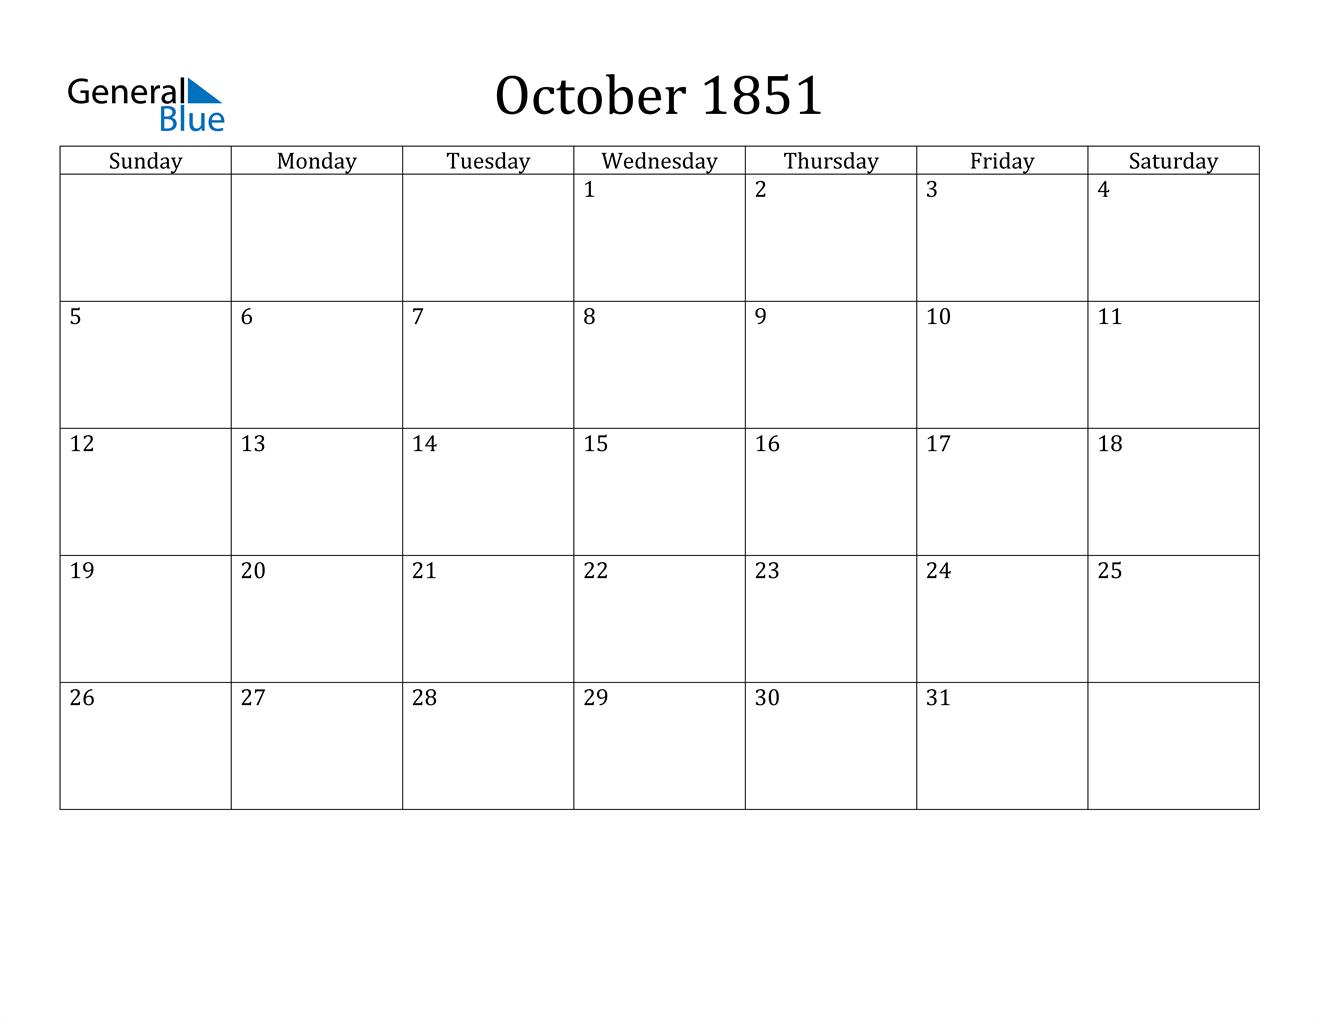 Image of October 1851 Calendar